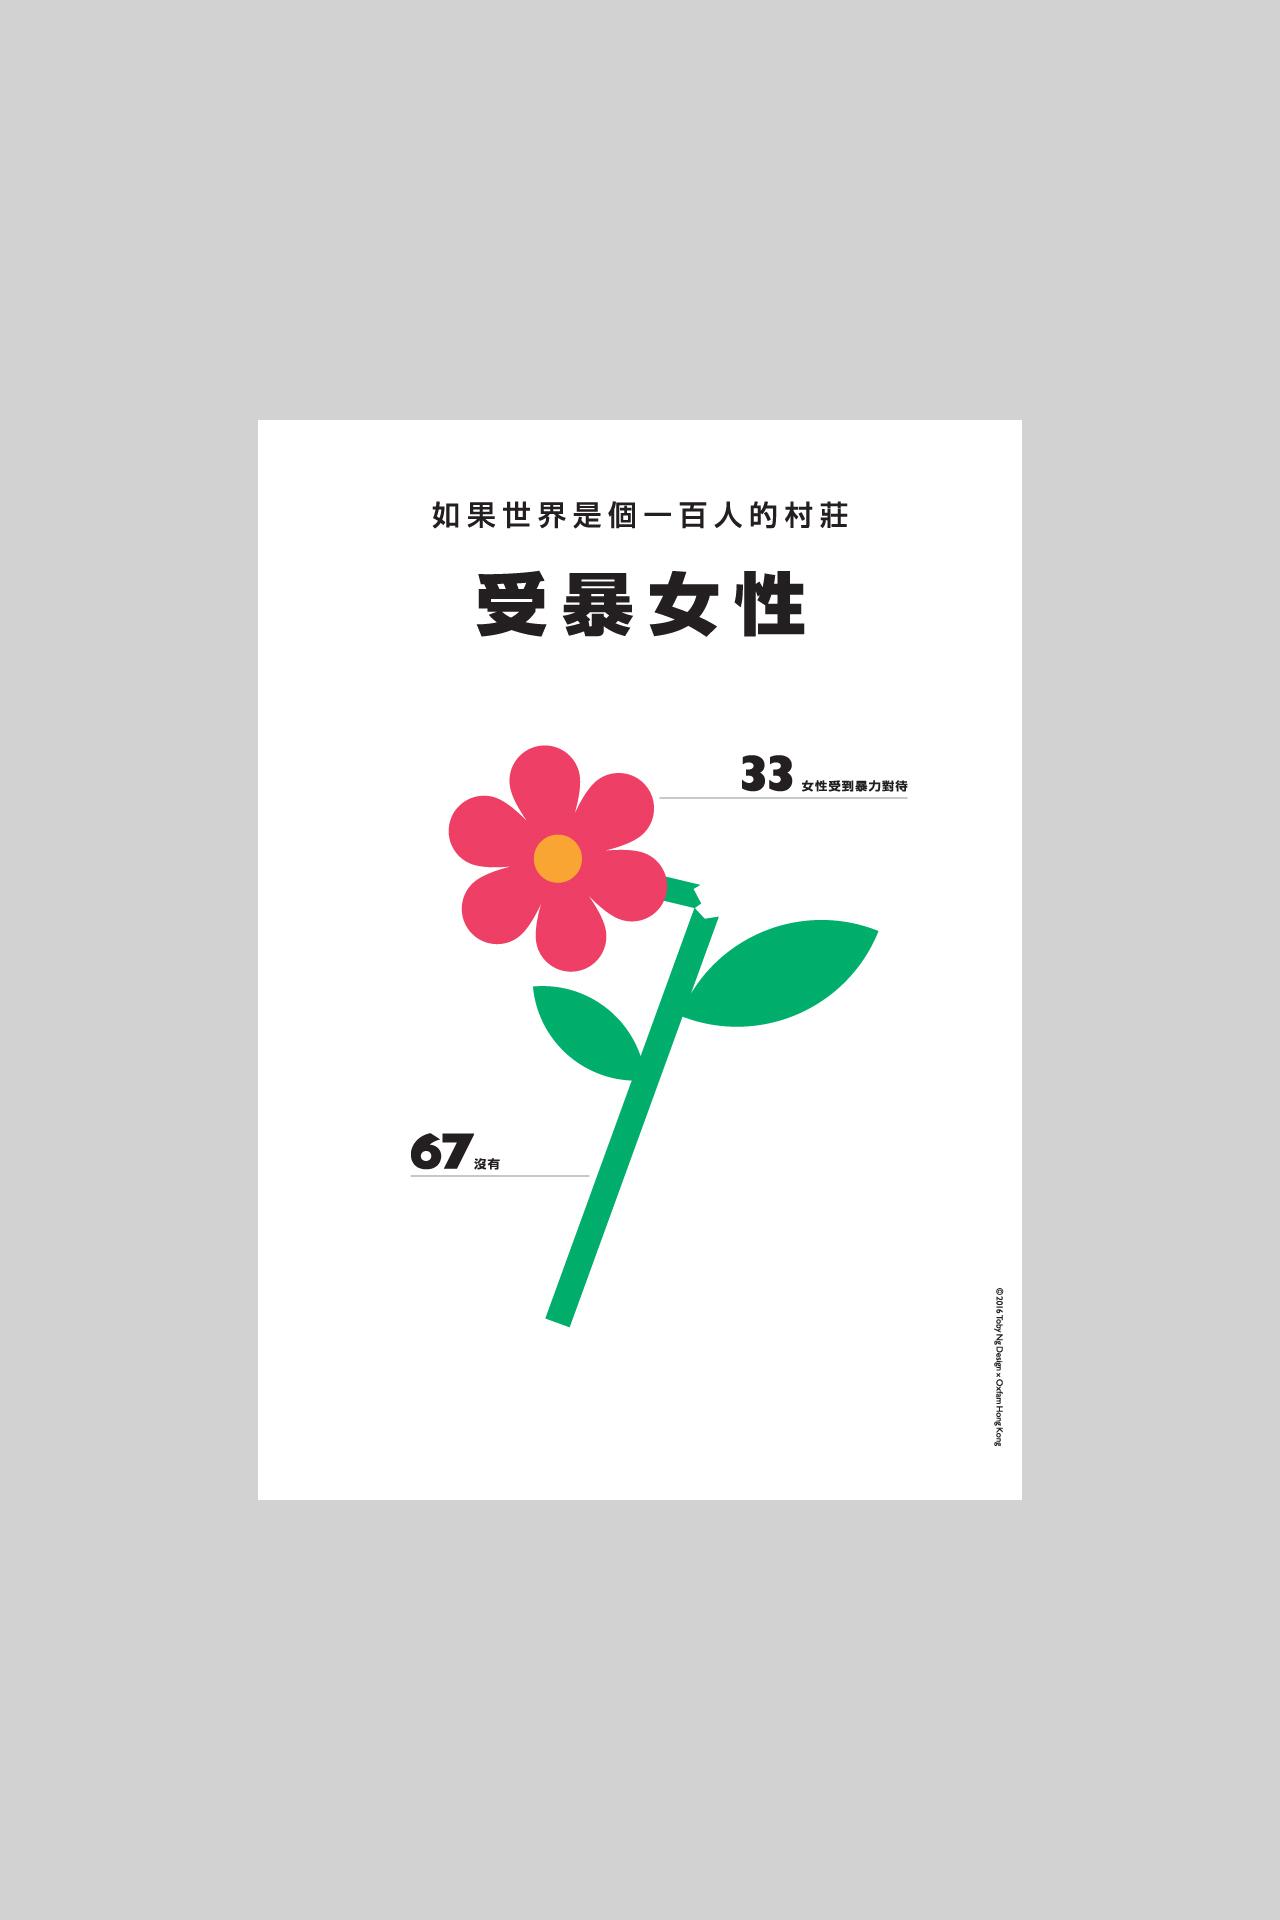 the-world-of-100-x-oxfam-hong-kong_11